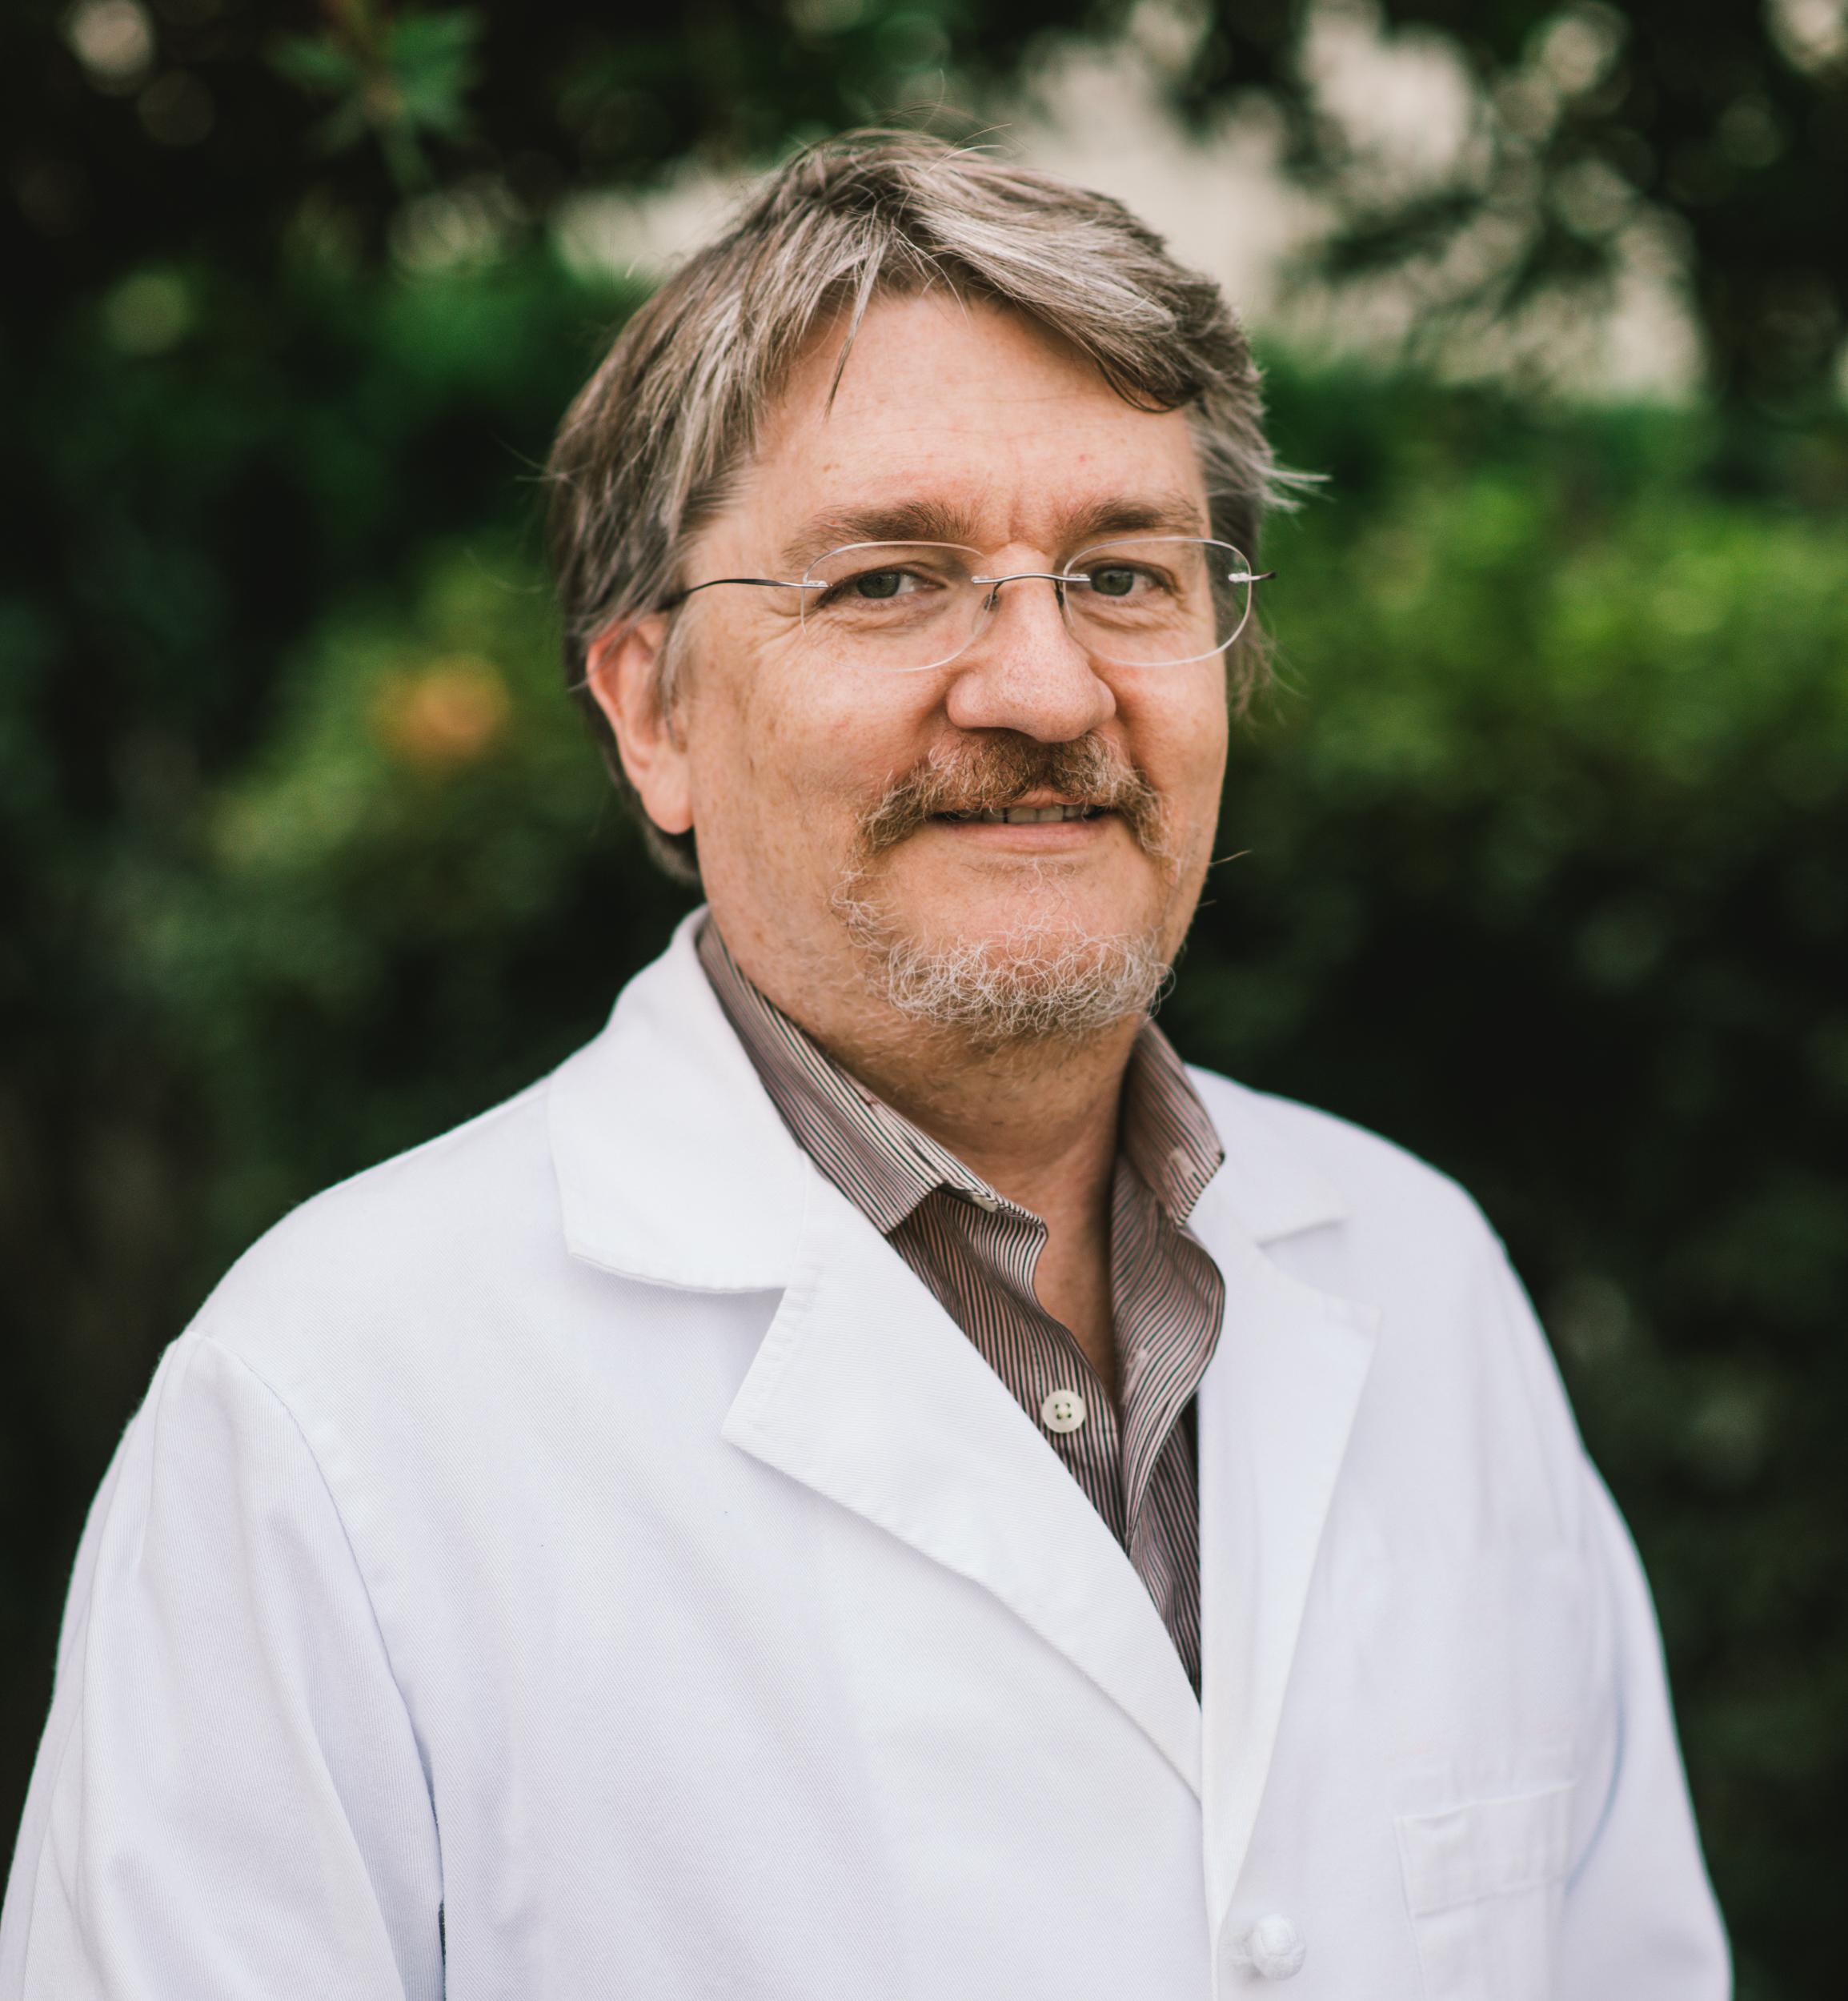 Joseph V. Mersol, M.D., PhD